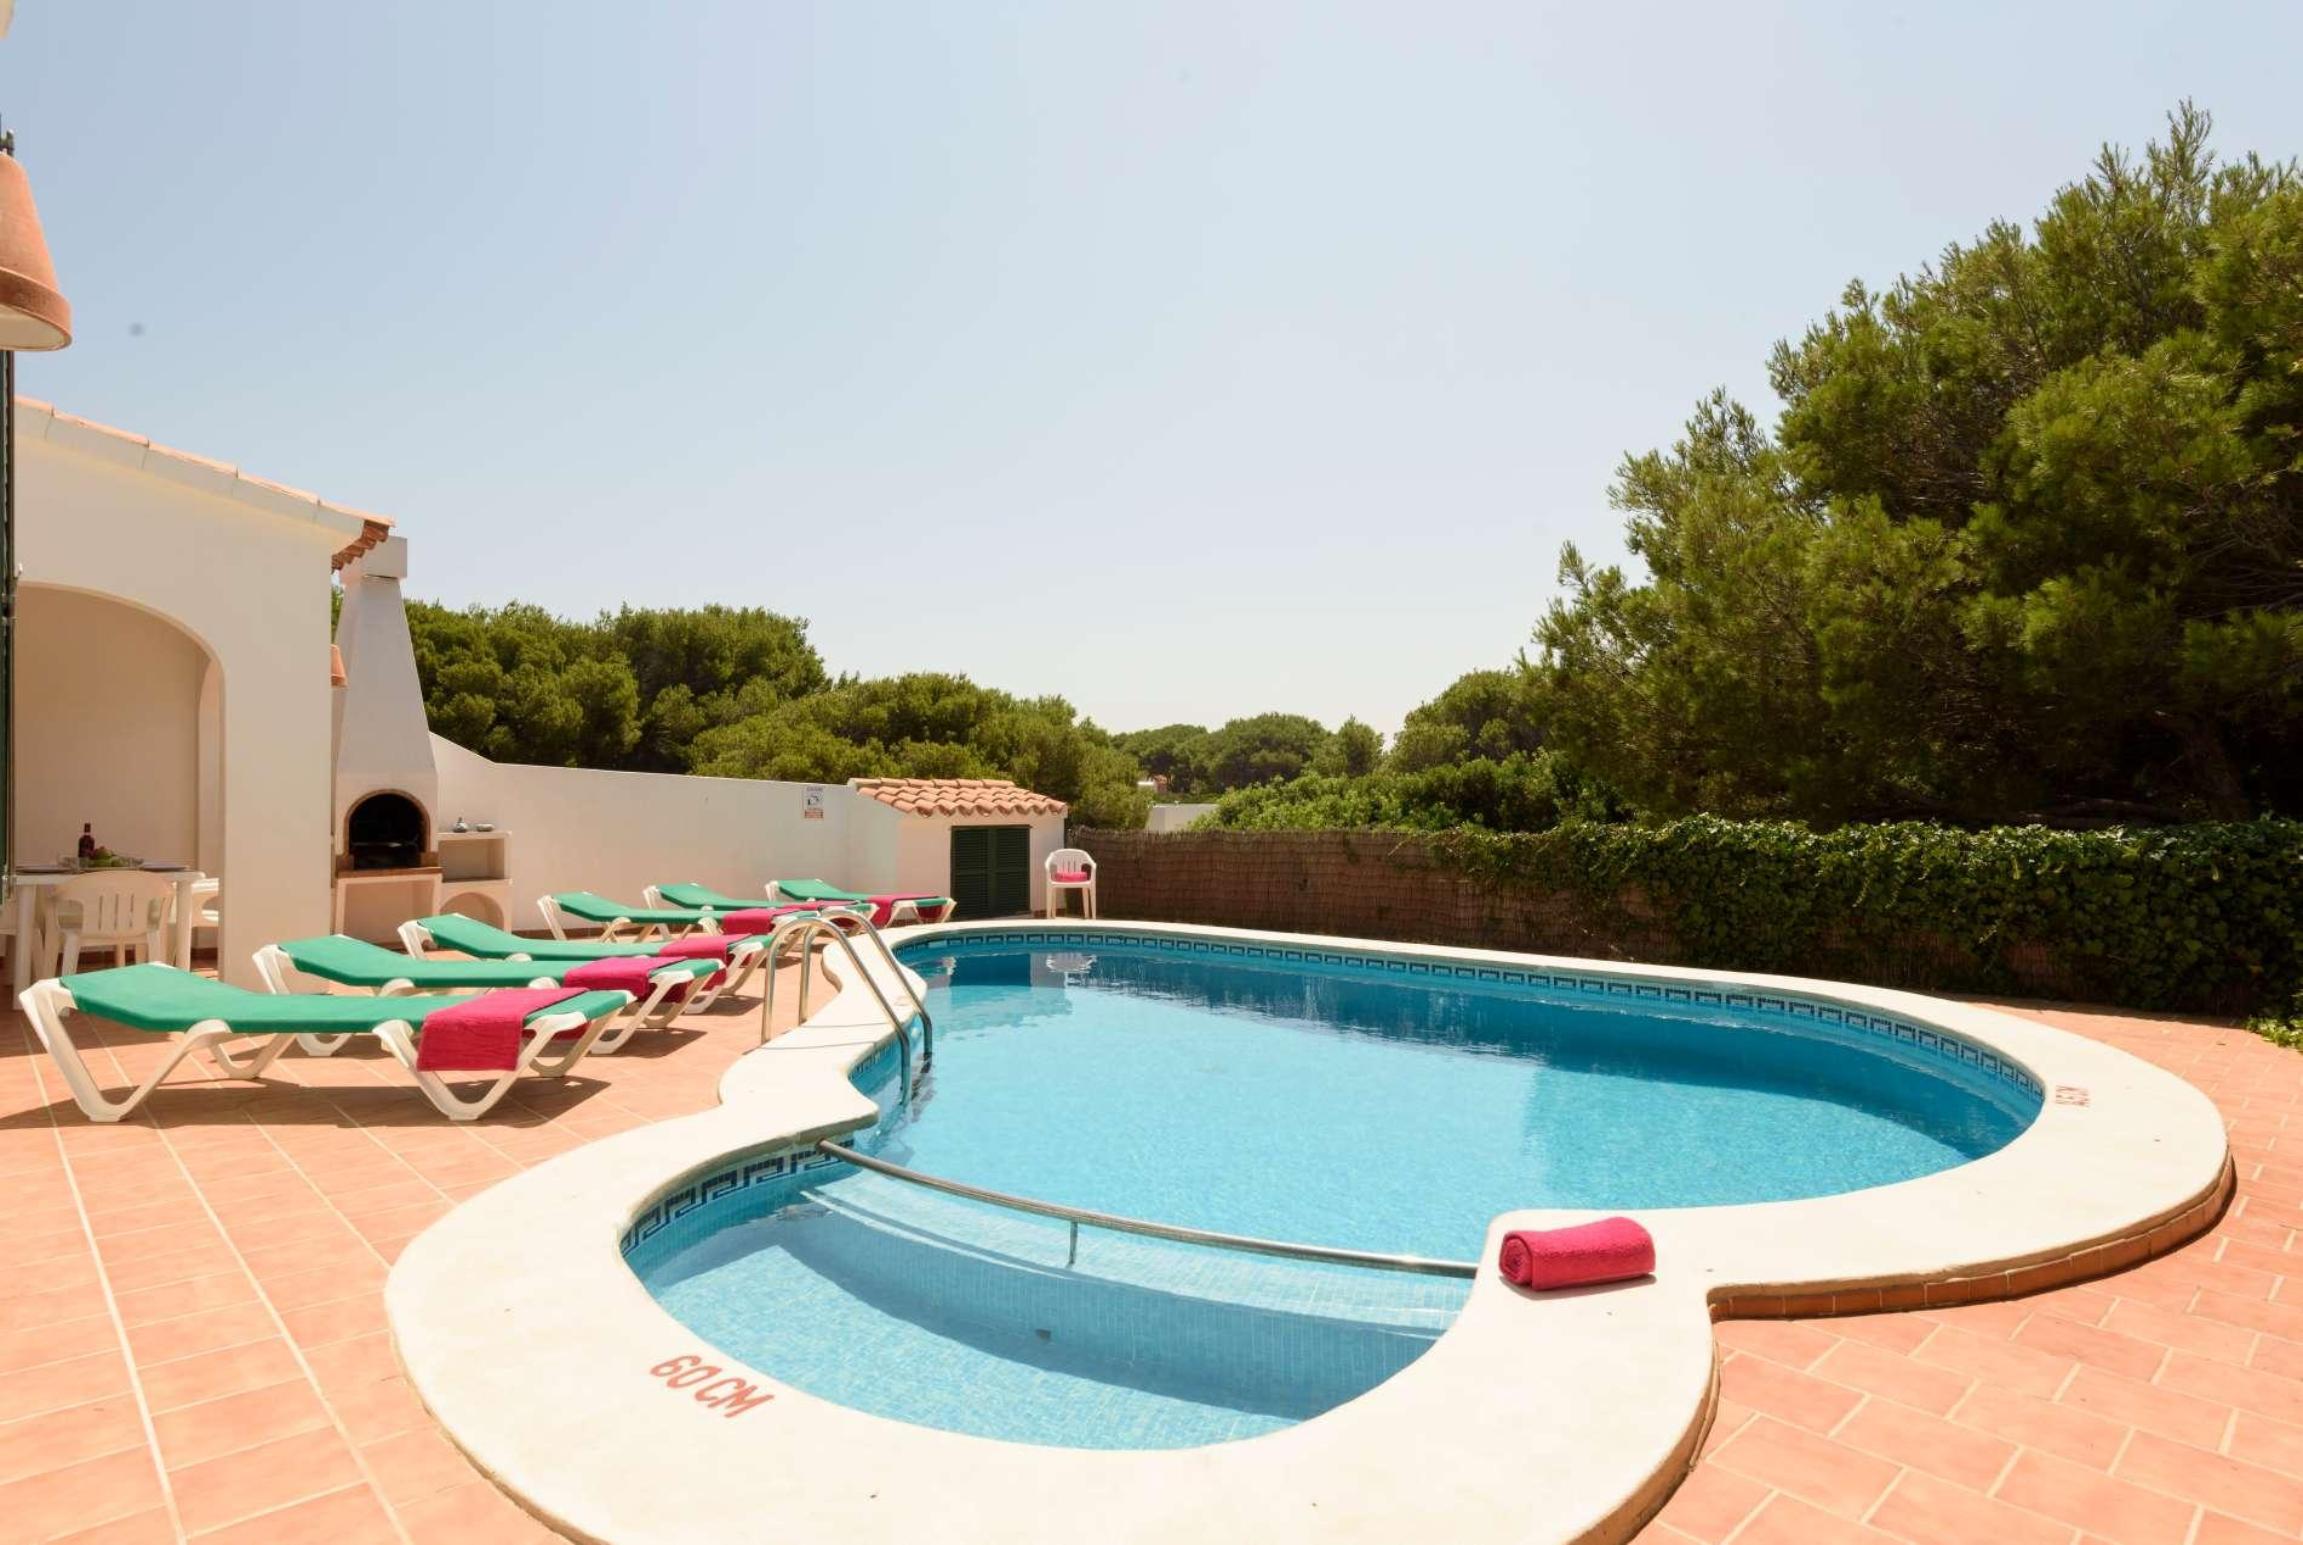 Ferienhaus Eulalia II (2653368), Arenal De'N Castell, Menorca, Balearische Inseln, Spanien, Bild 16